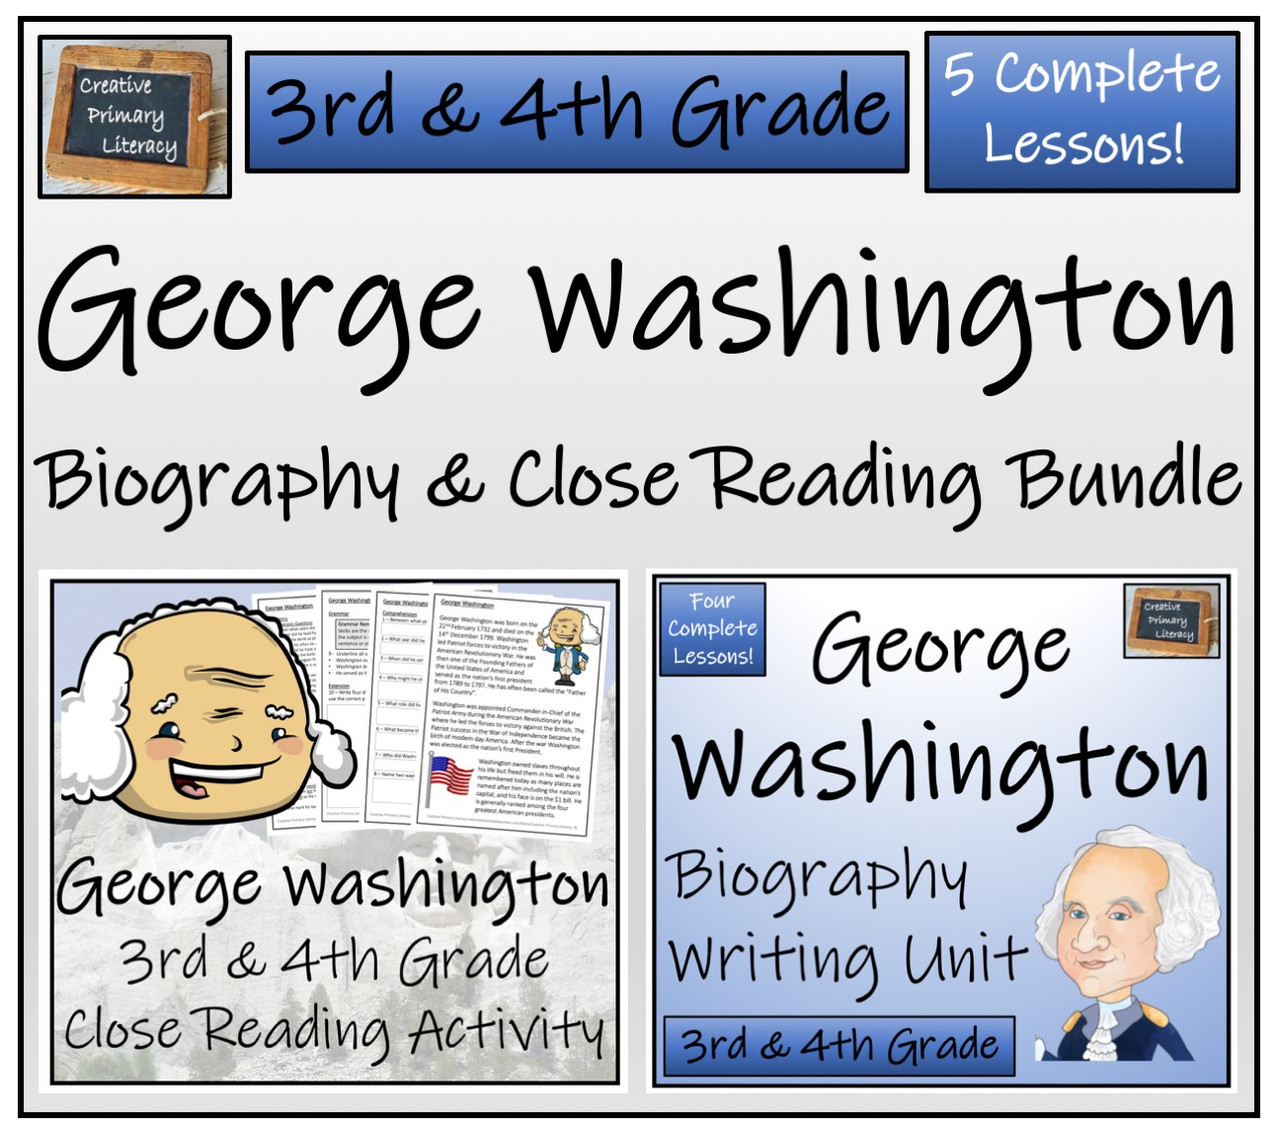 hight resolution of George Washington - 3rd \u0026 4th Grade Close Read \u0026 Biography Writing Bundle -  Amped Up Learning